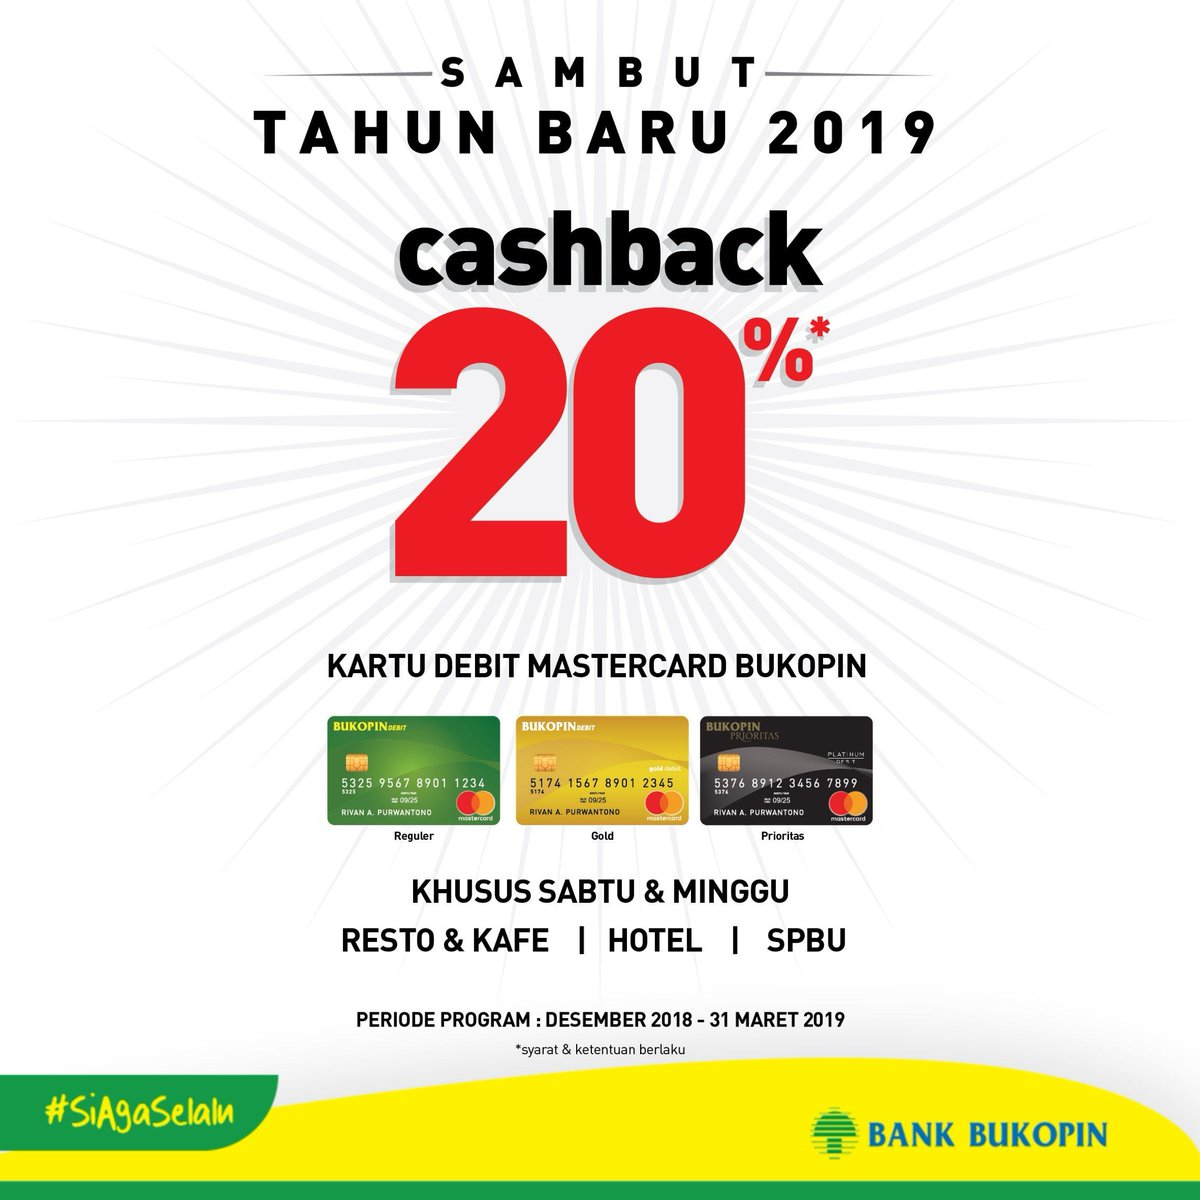 Bank Bukopin - Promo Cashback 20% Sambut Tahun Baru 2019